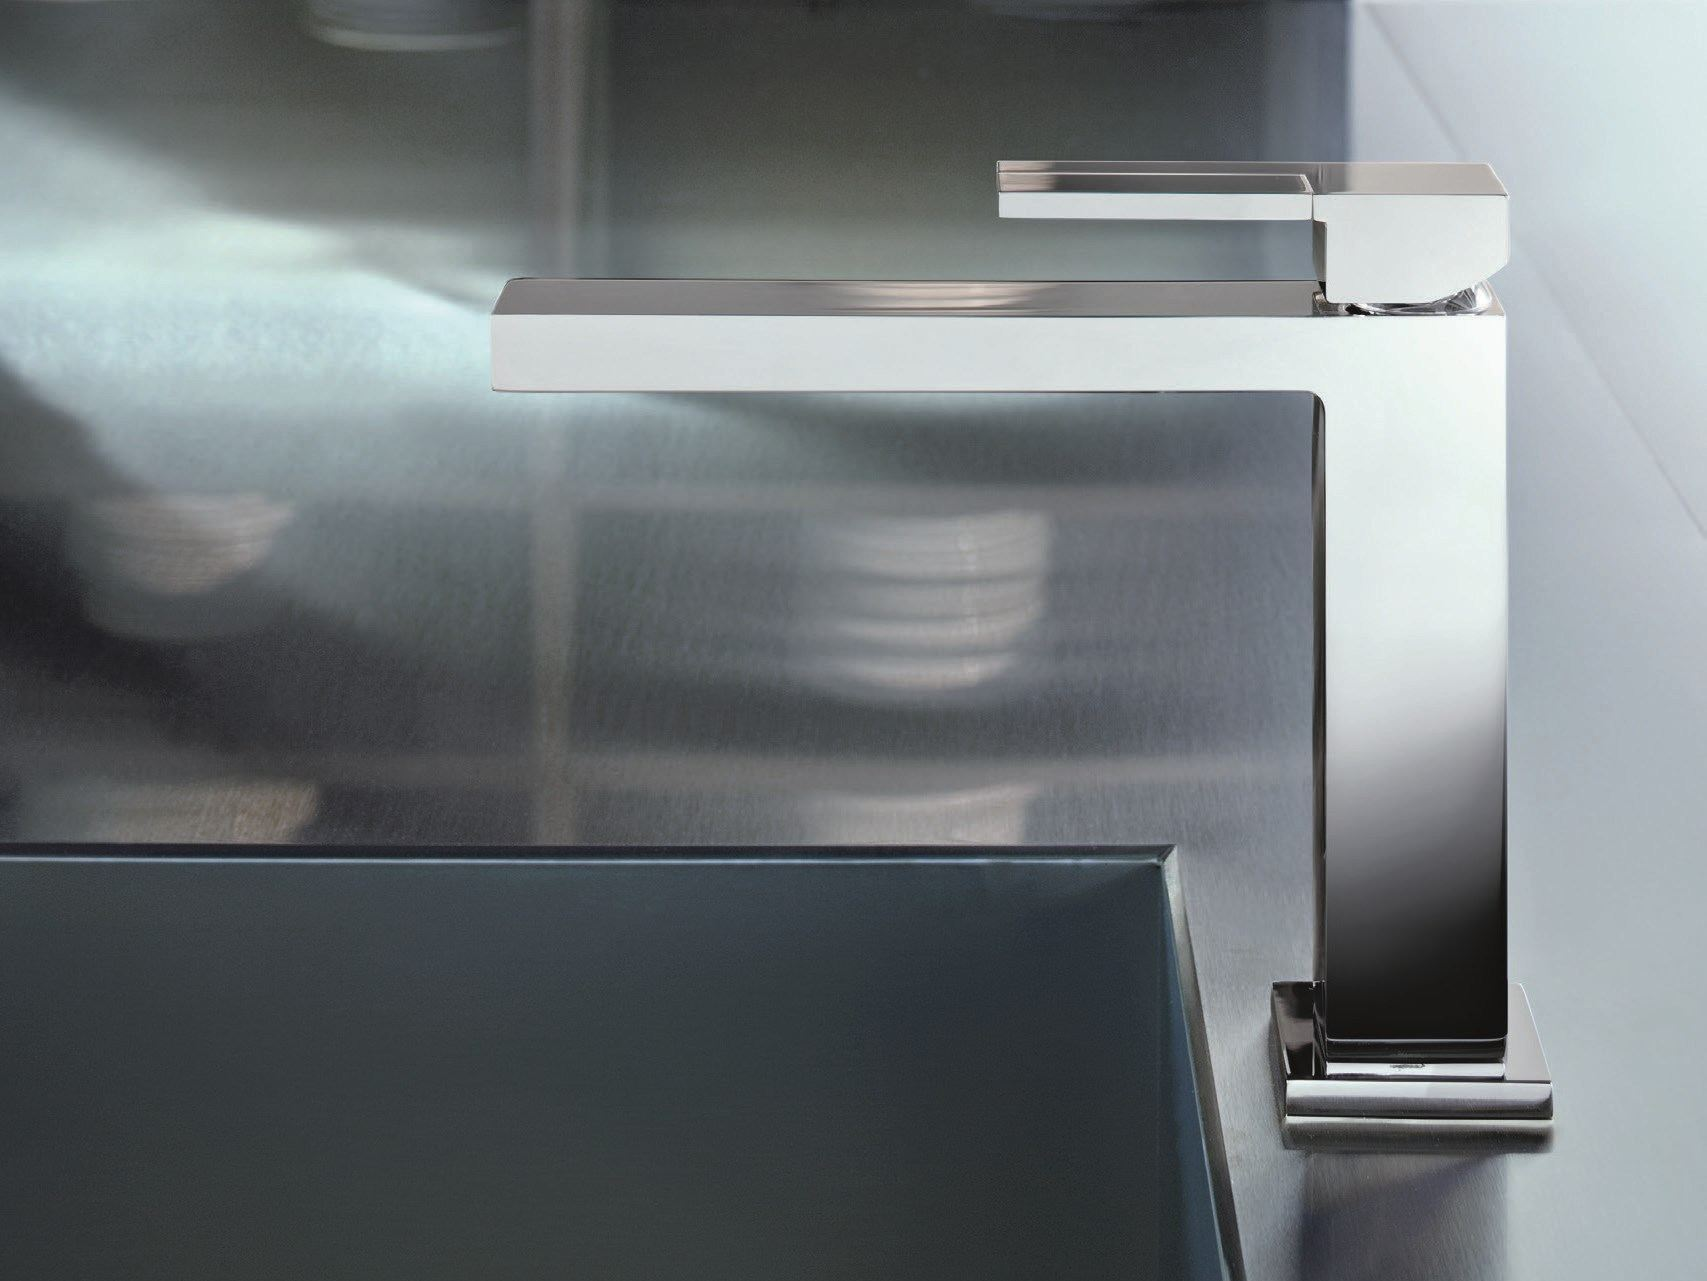 AR/38 Kitchen Mixer